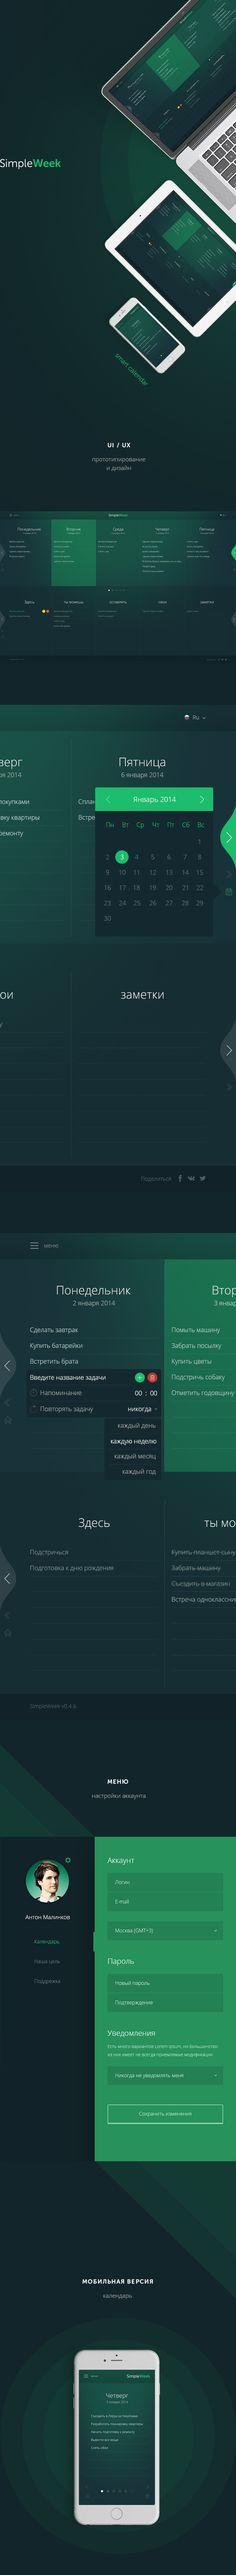 SimpleWeek Interaction Design, UI/UX, Web Design